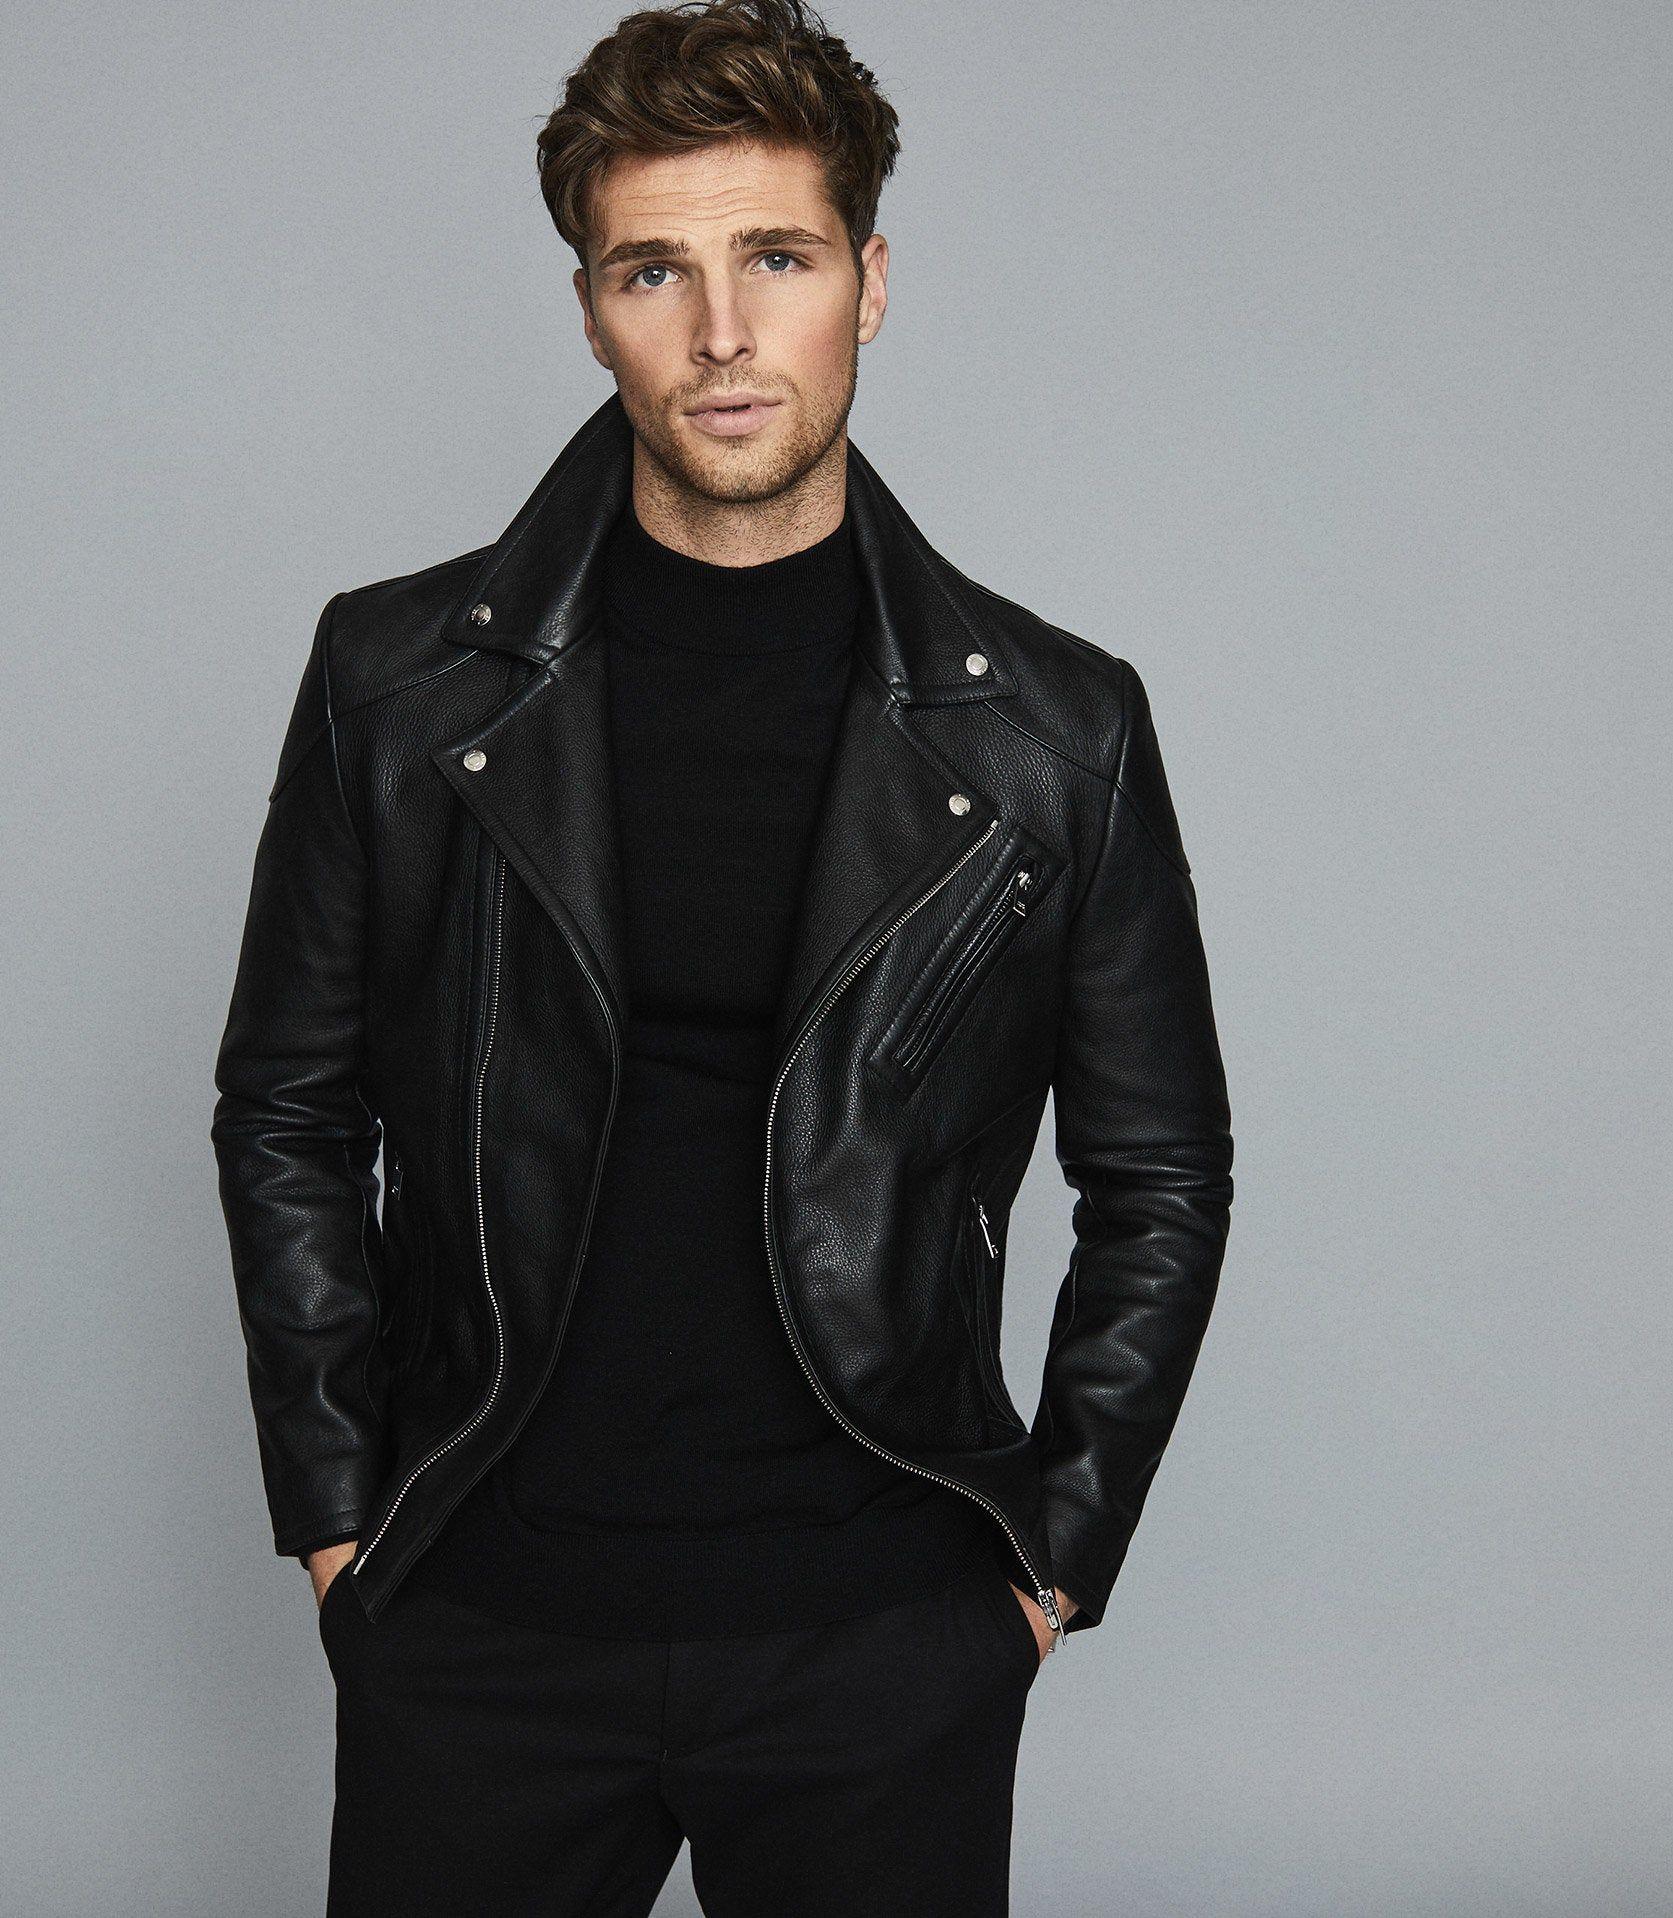 Reiss Mimo Leather Biker Jacket In Black Mens Size Xs Black Leather Jacket Men Best Leather Jacket Brands Best Leather Jackets [ 1918 x 1673 Pixel ]